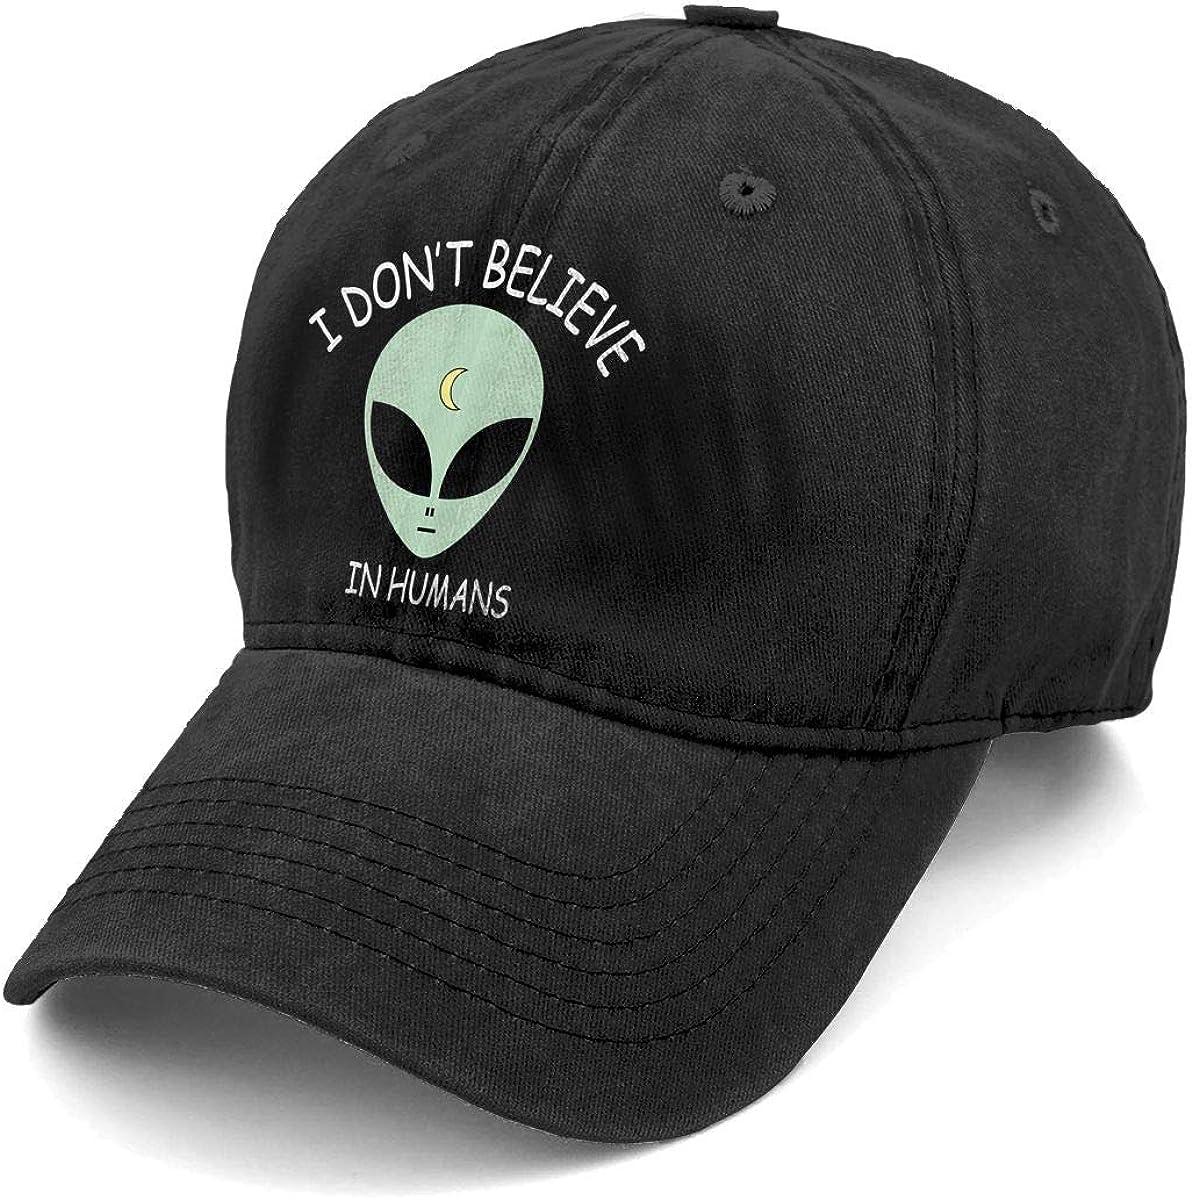 Science Care What You Believe Adjustable Denim Hat Adult Vintage Baseball Cap